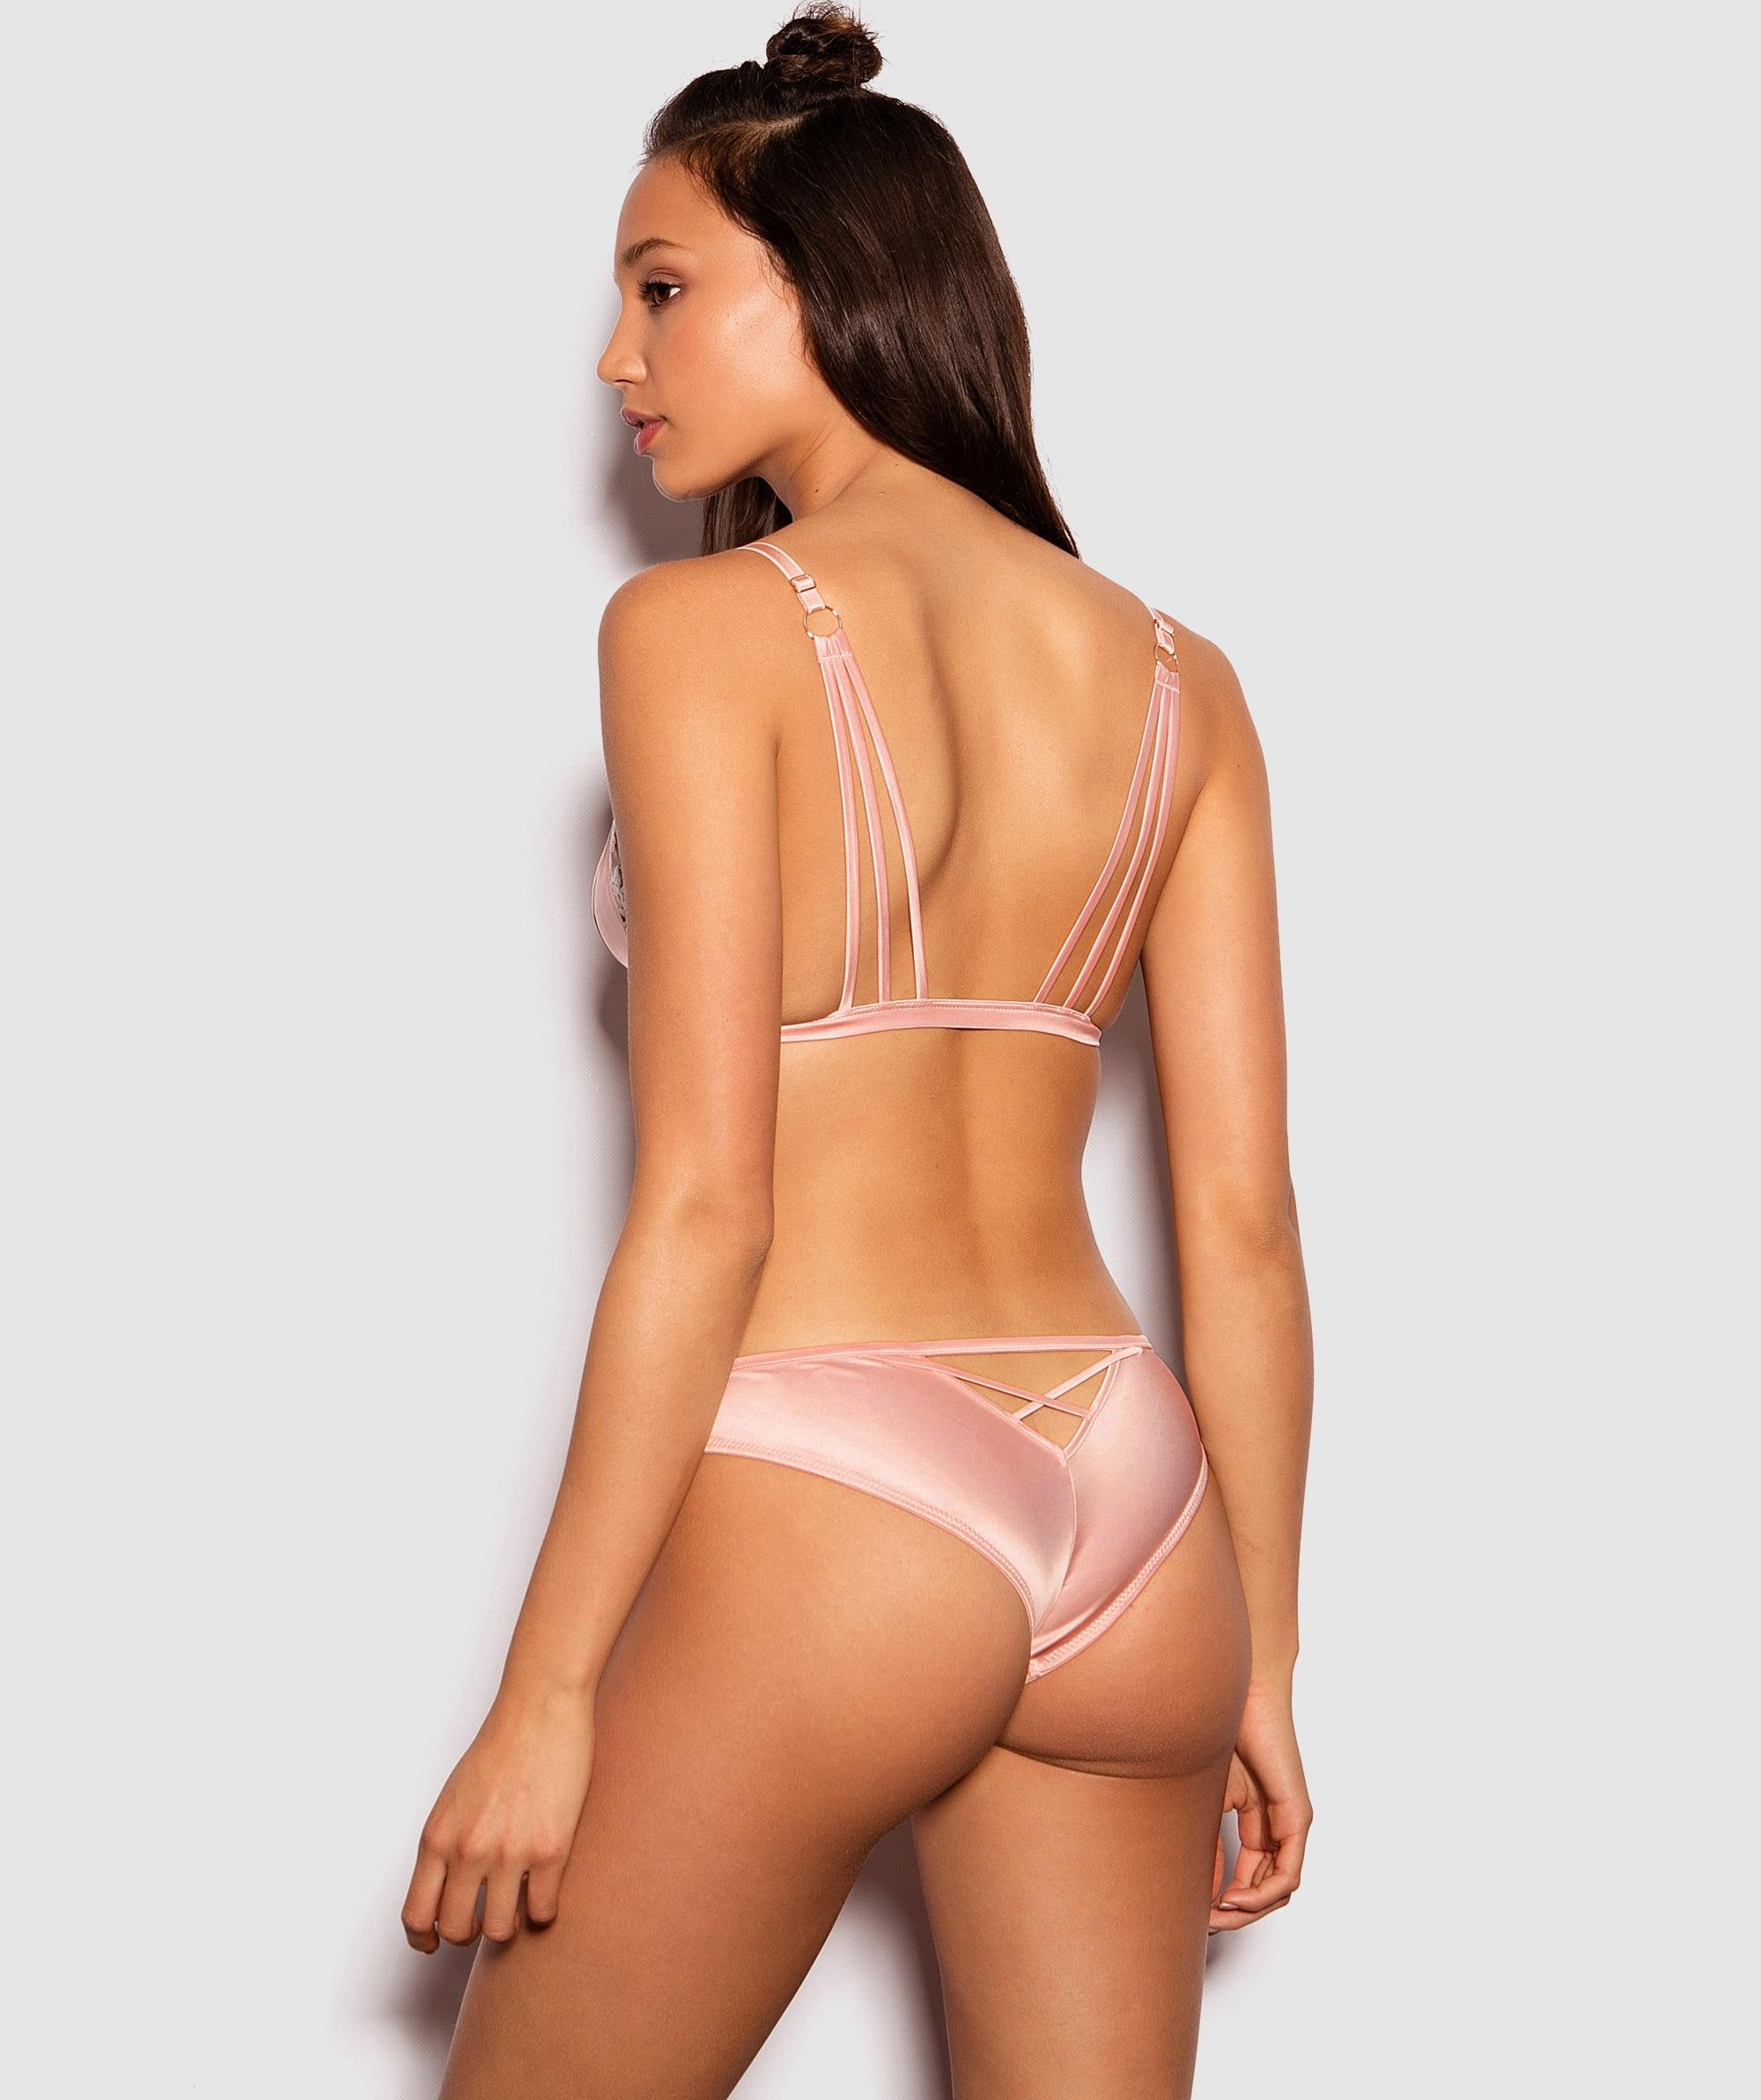 Enchanted Chloe Brazilian Knicker - Light Pink/ White